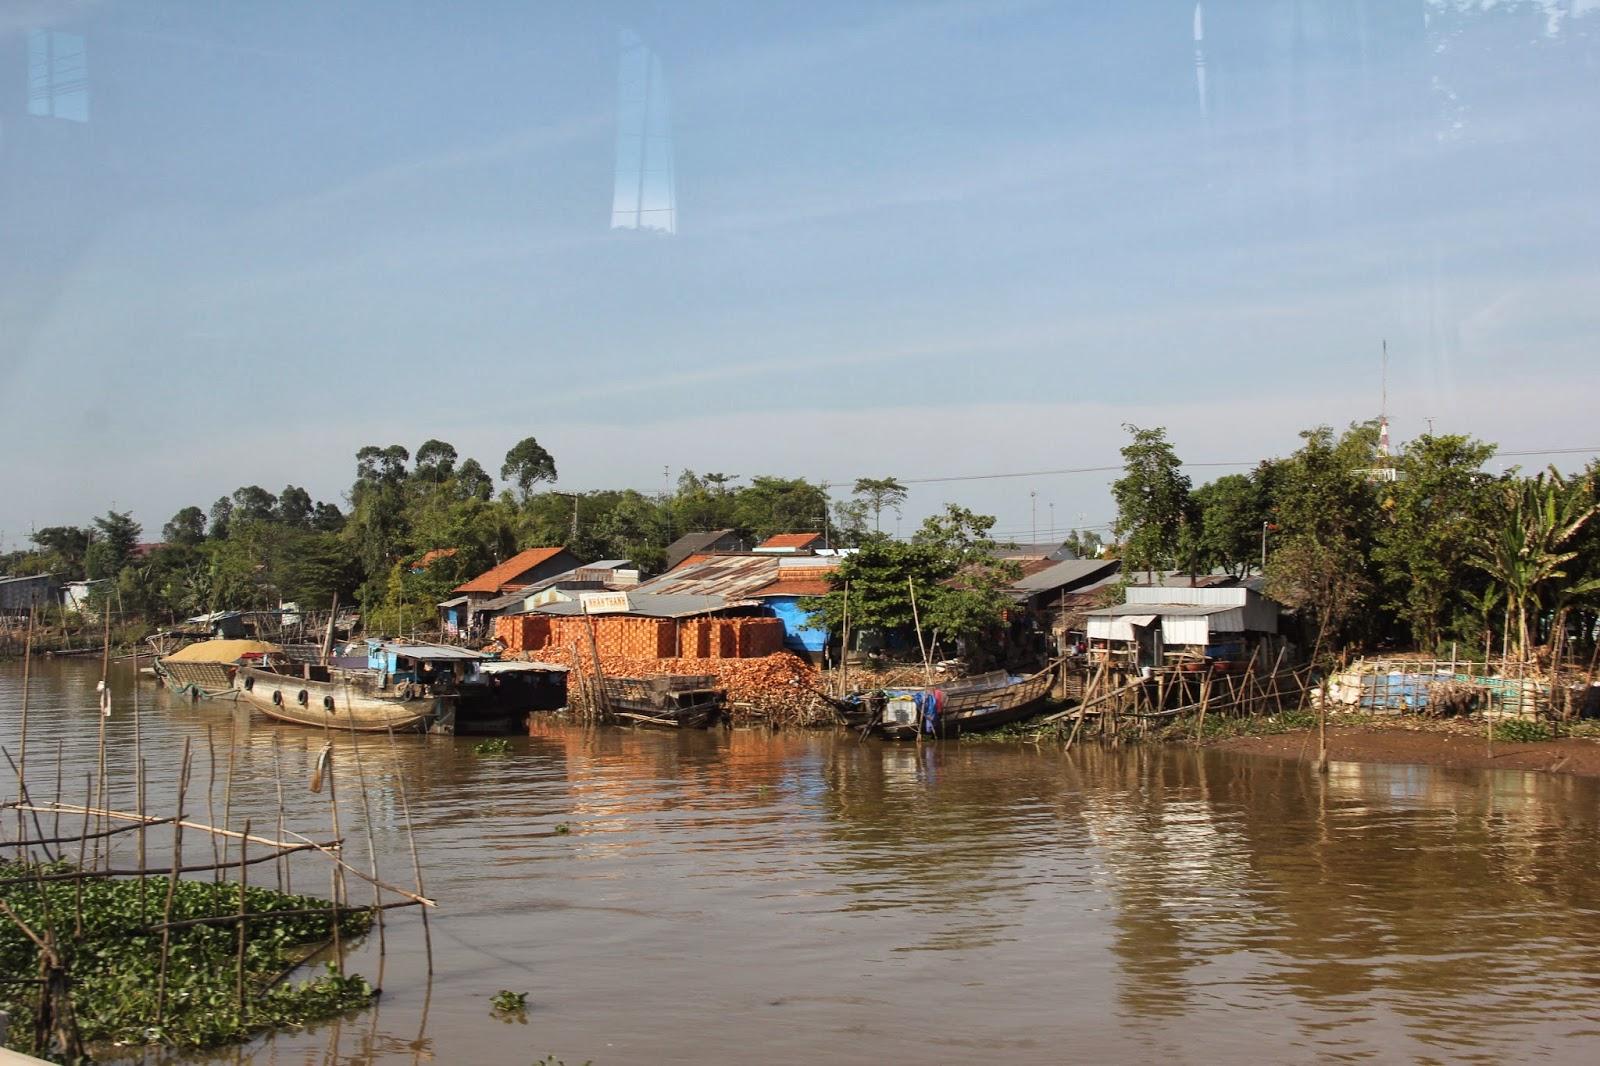 A riverside brickyard in southern Vietnam.